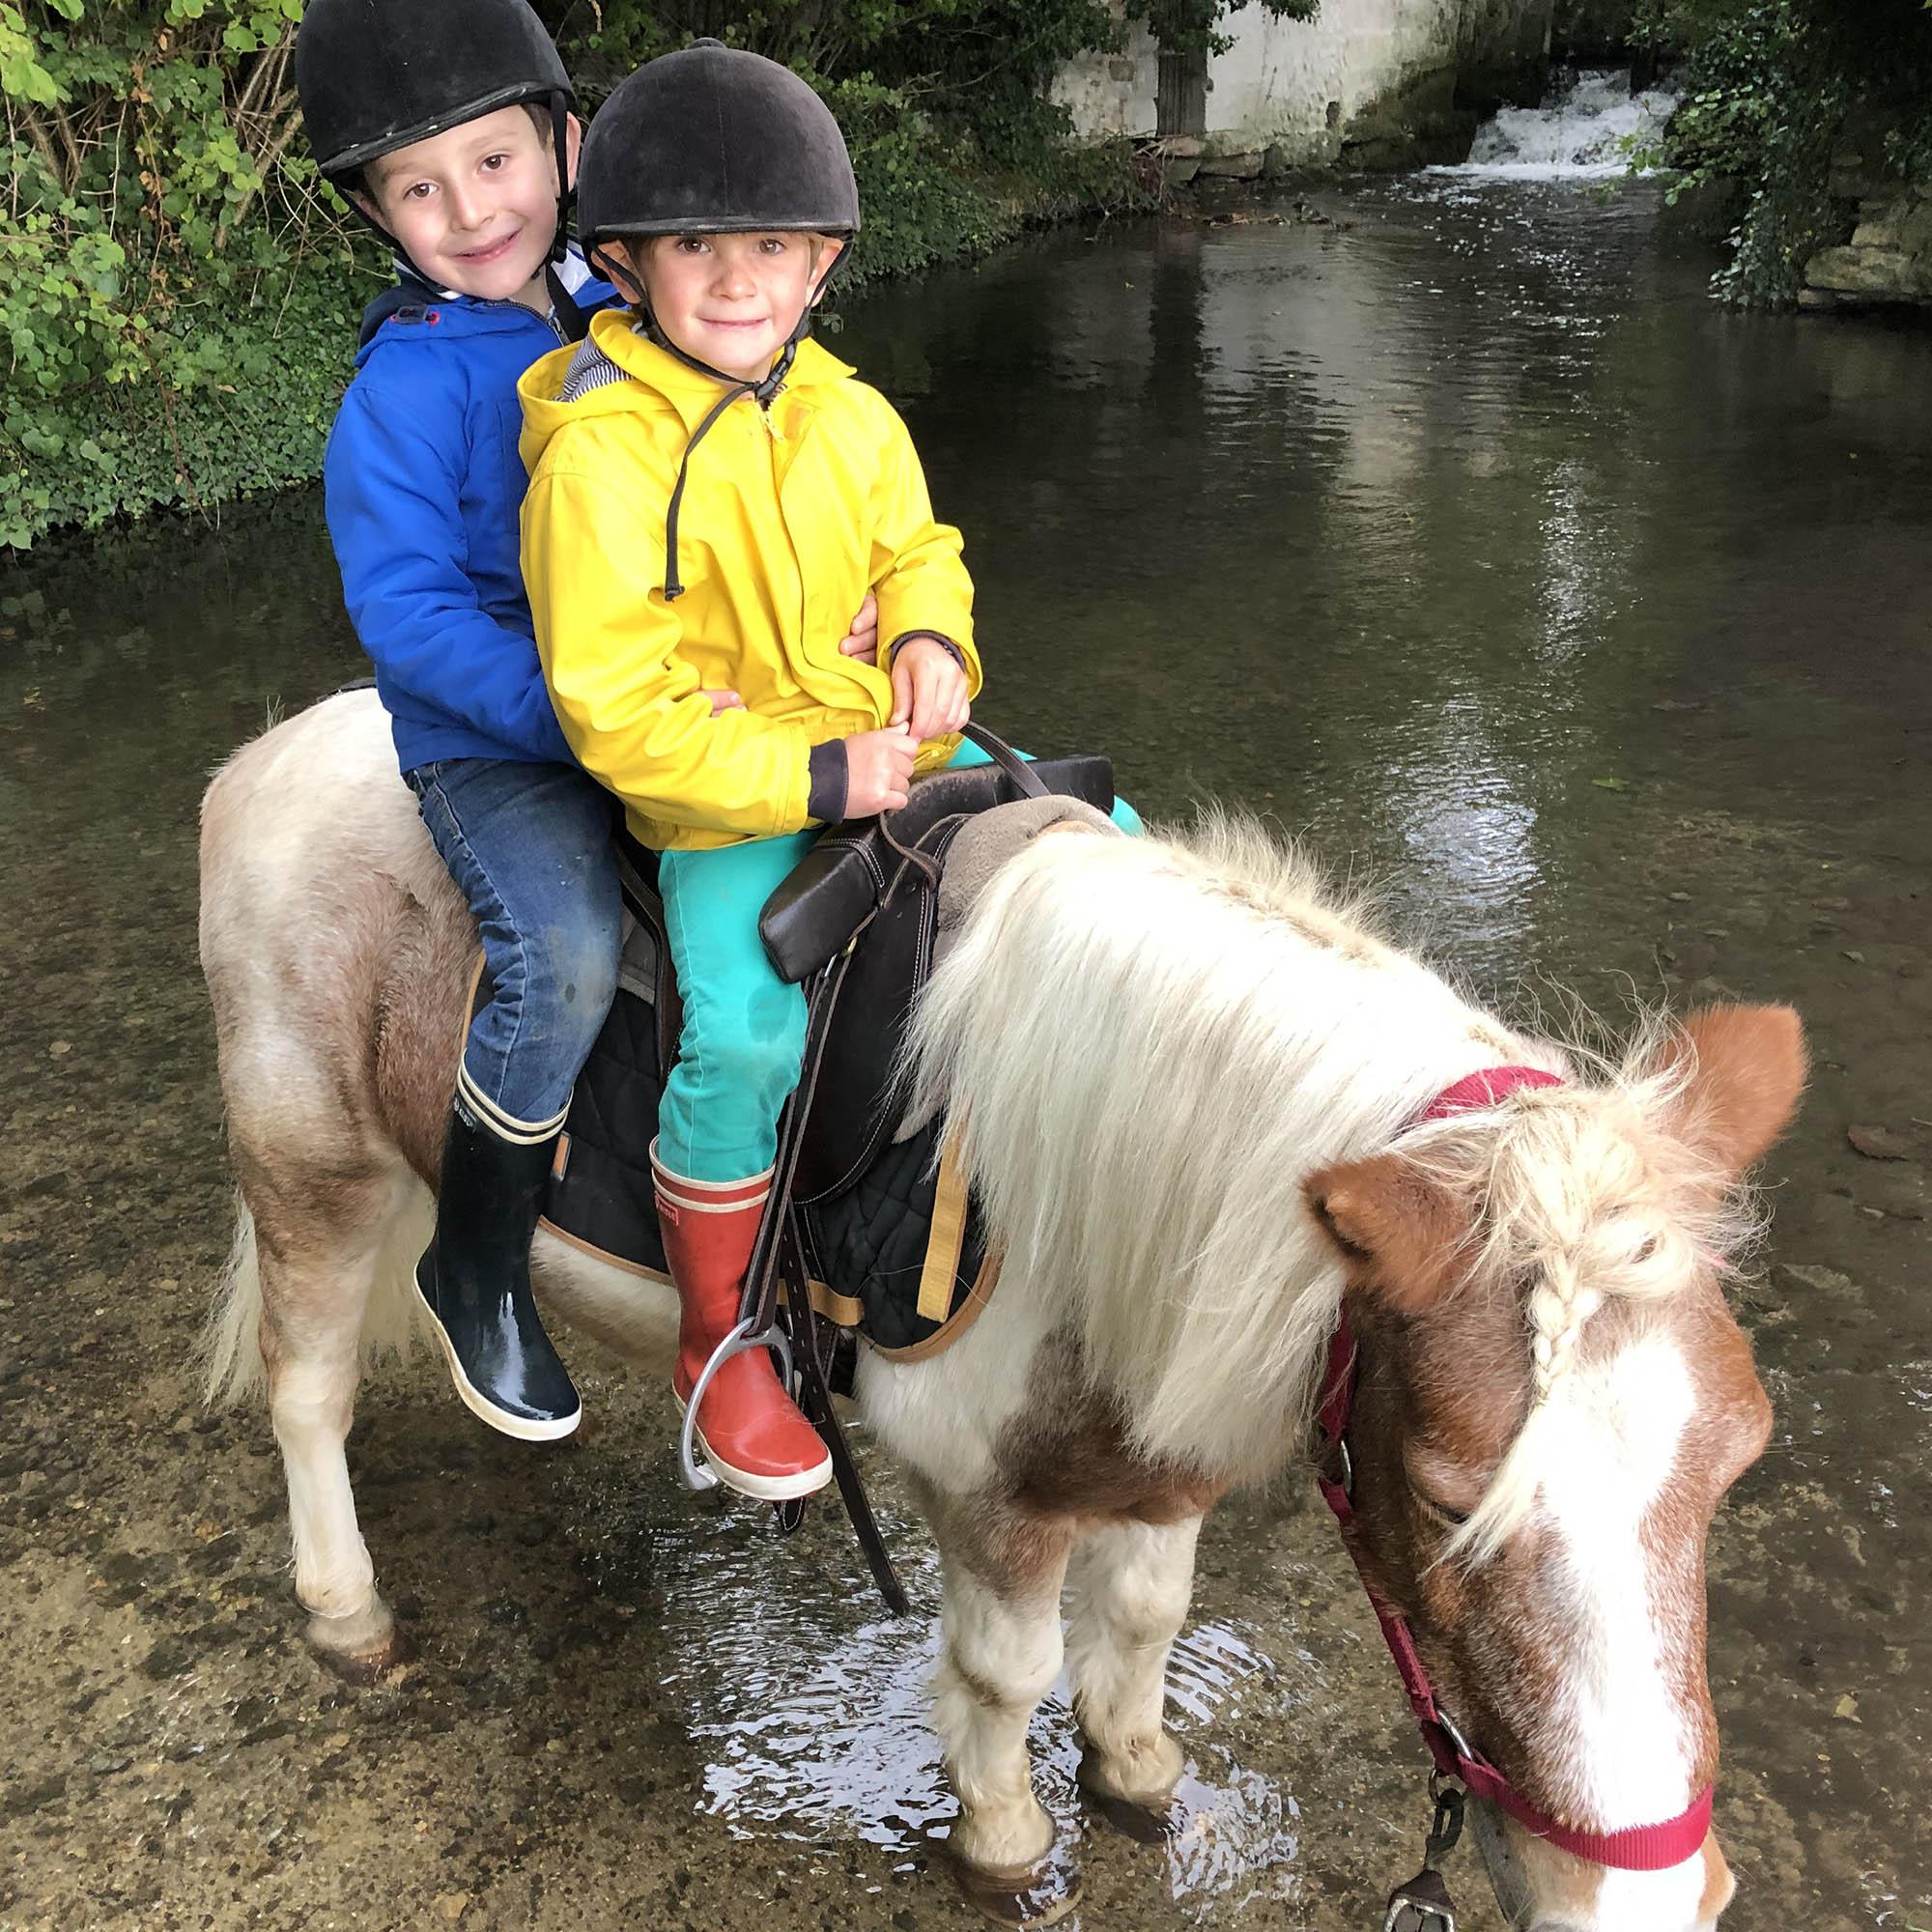 équitation_cheval_gîte_saint_germain_oise_versigny